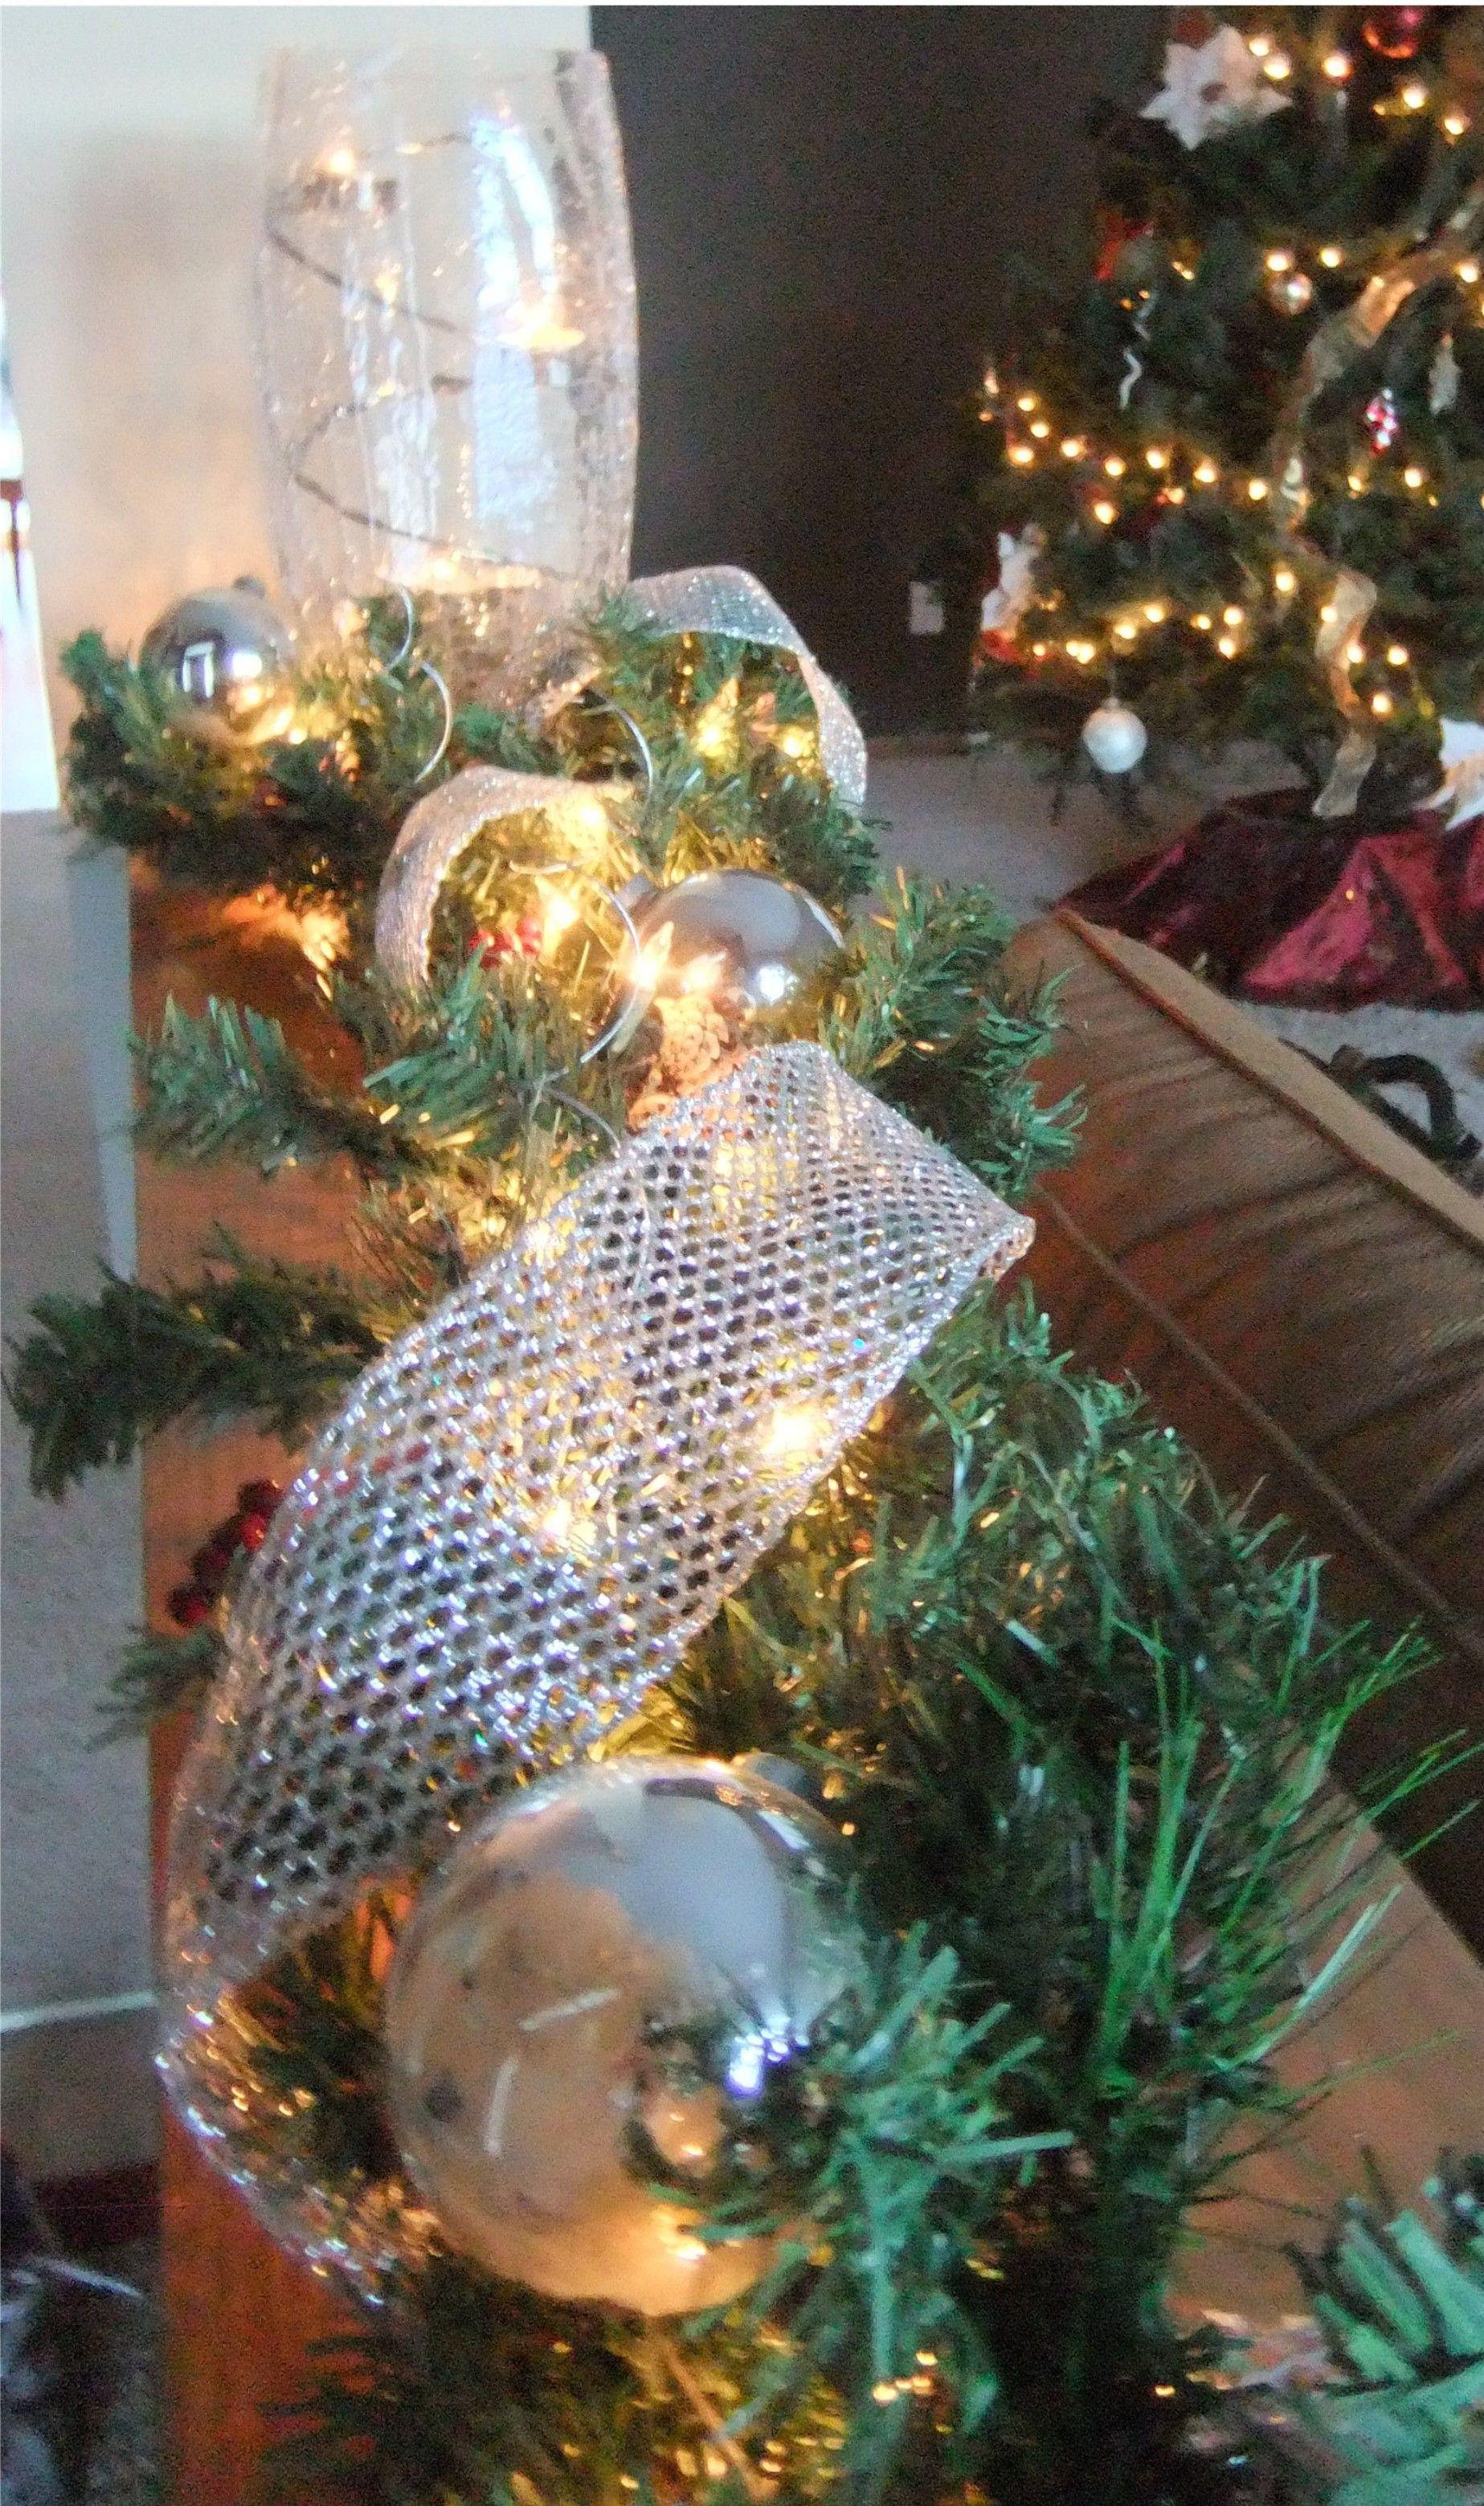 Christmas Garland Entry Ledge Decoration Idea